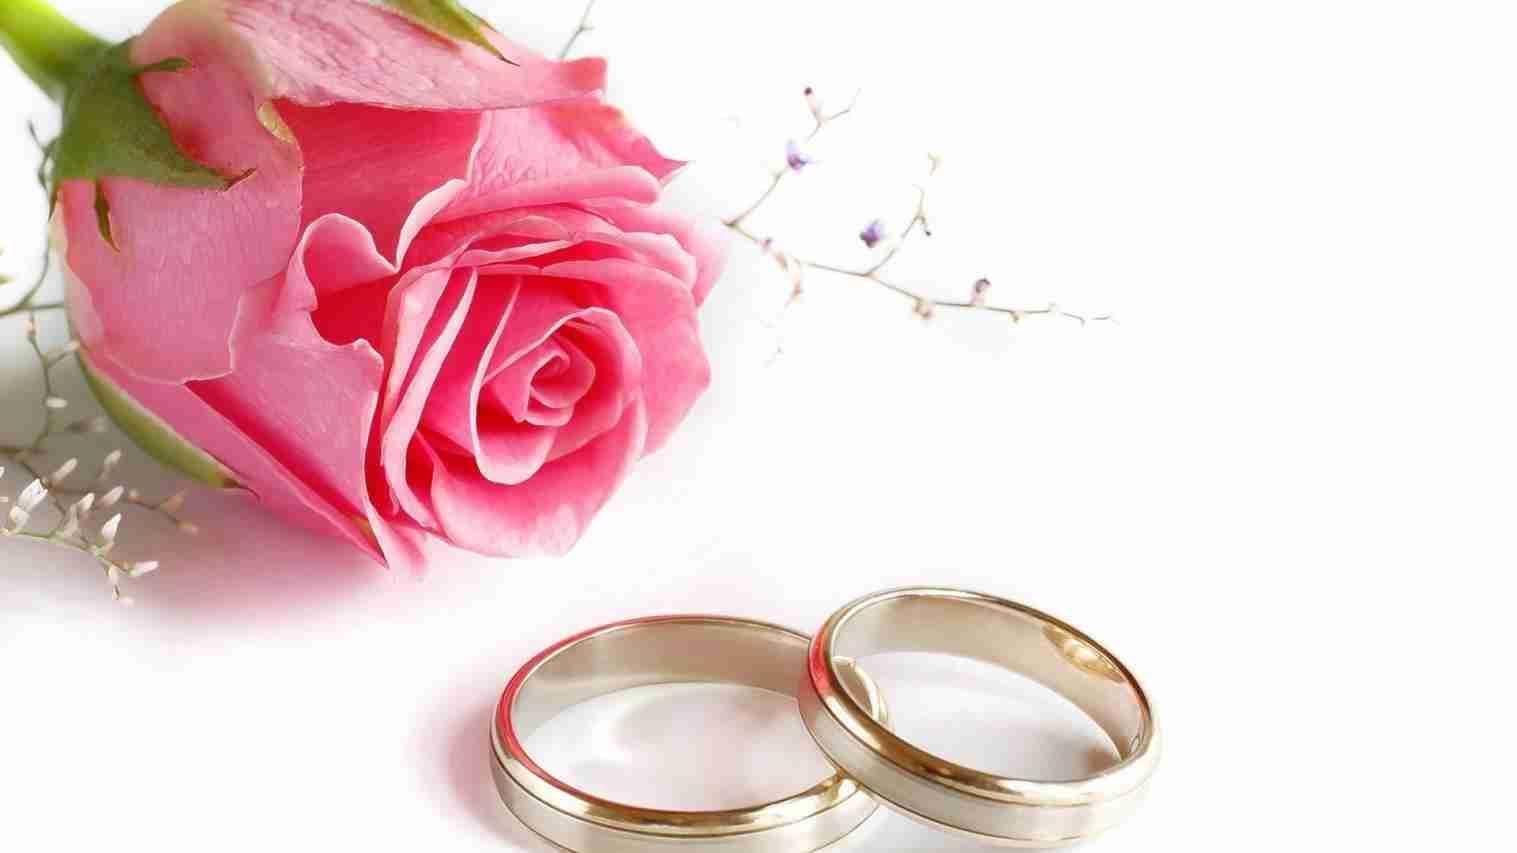 wedding rings and flowers wallpaper | Weddings | Pinterest | Flower ...